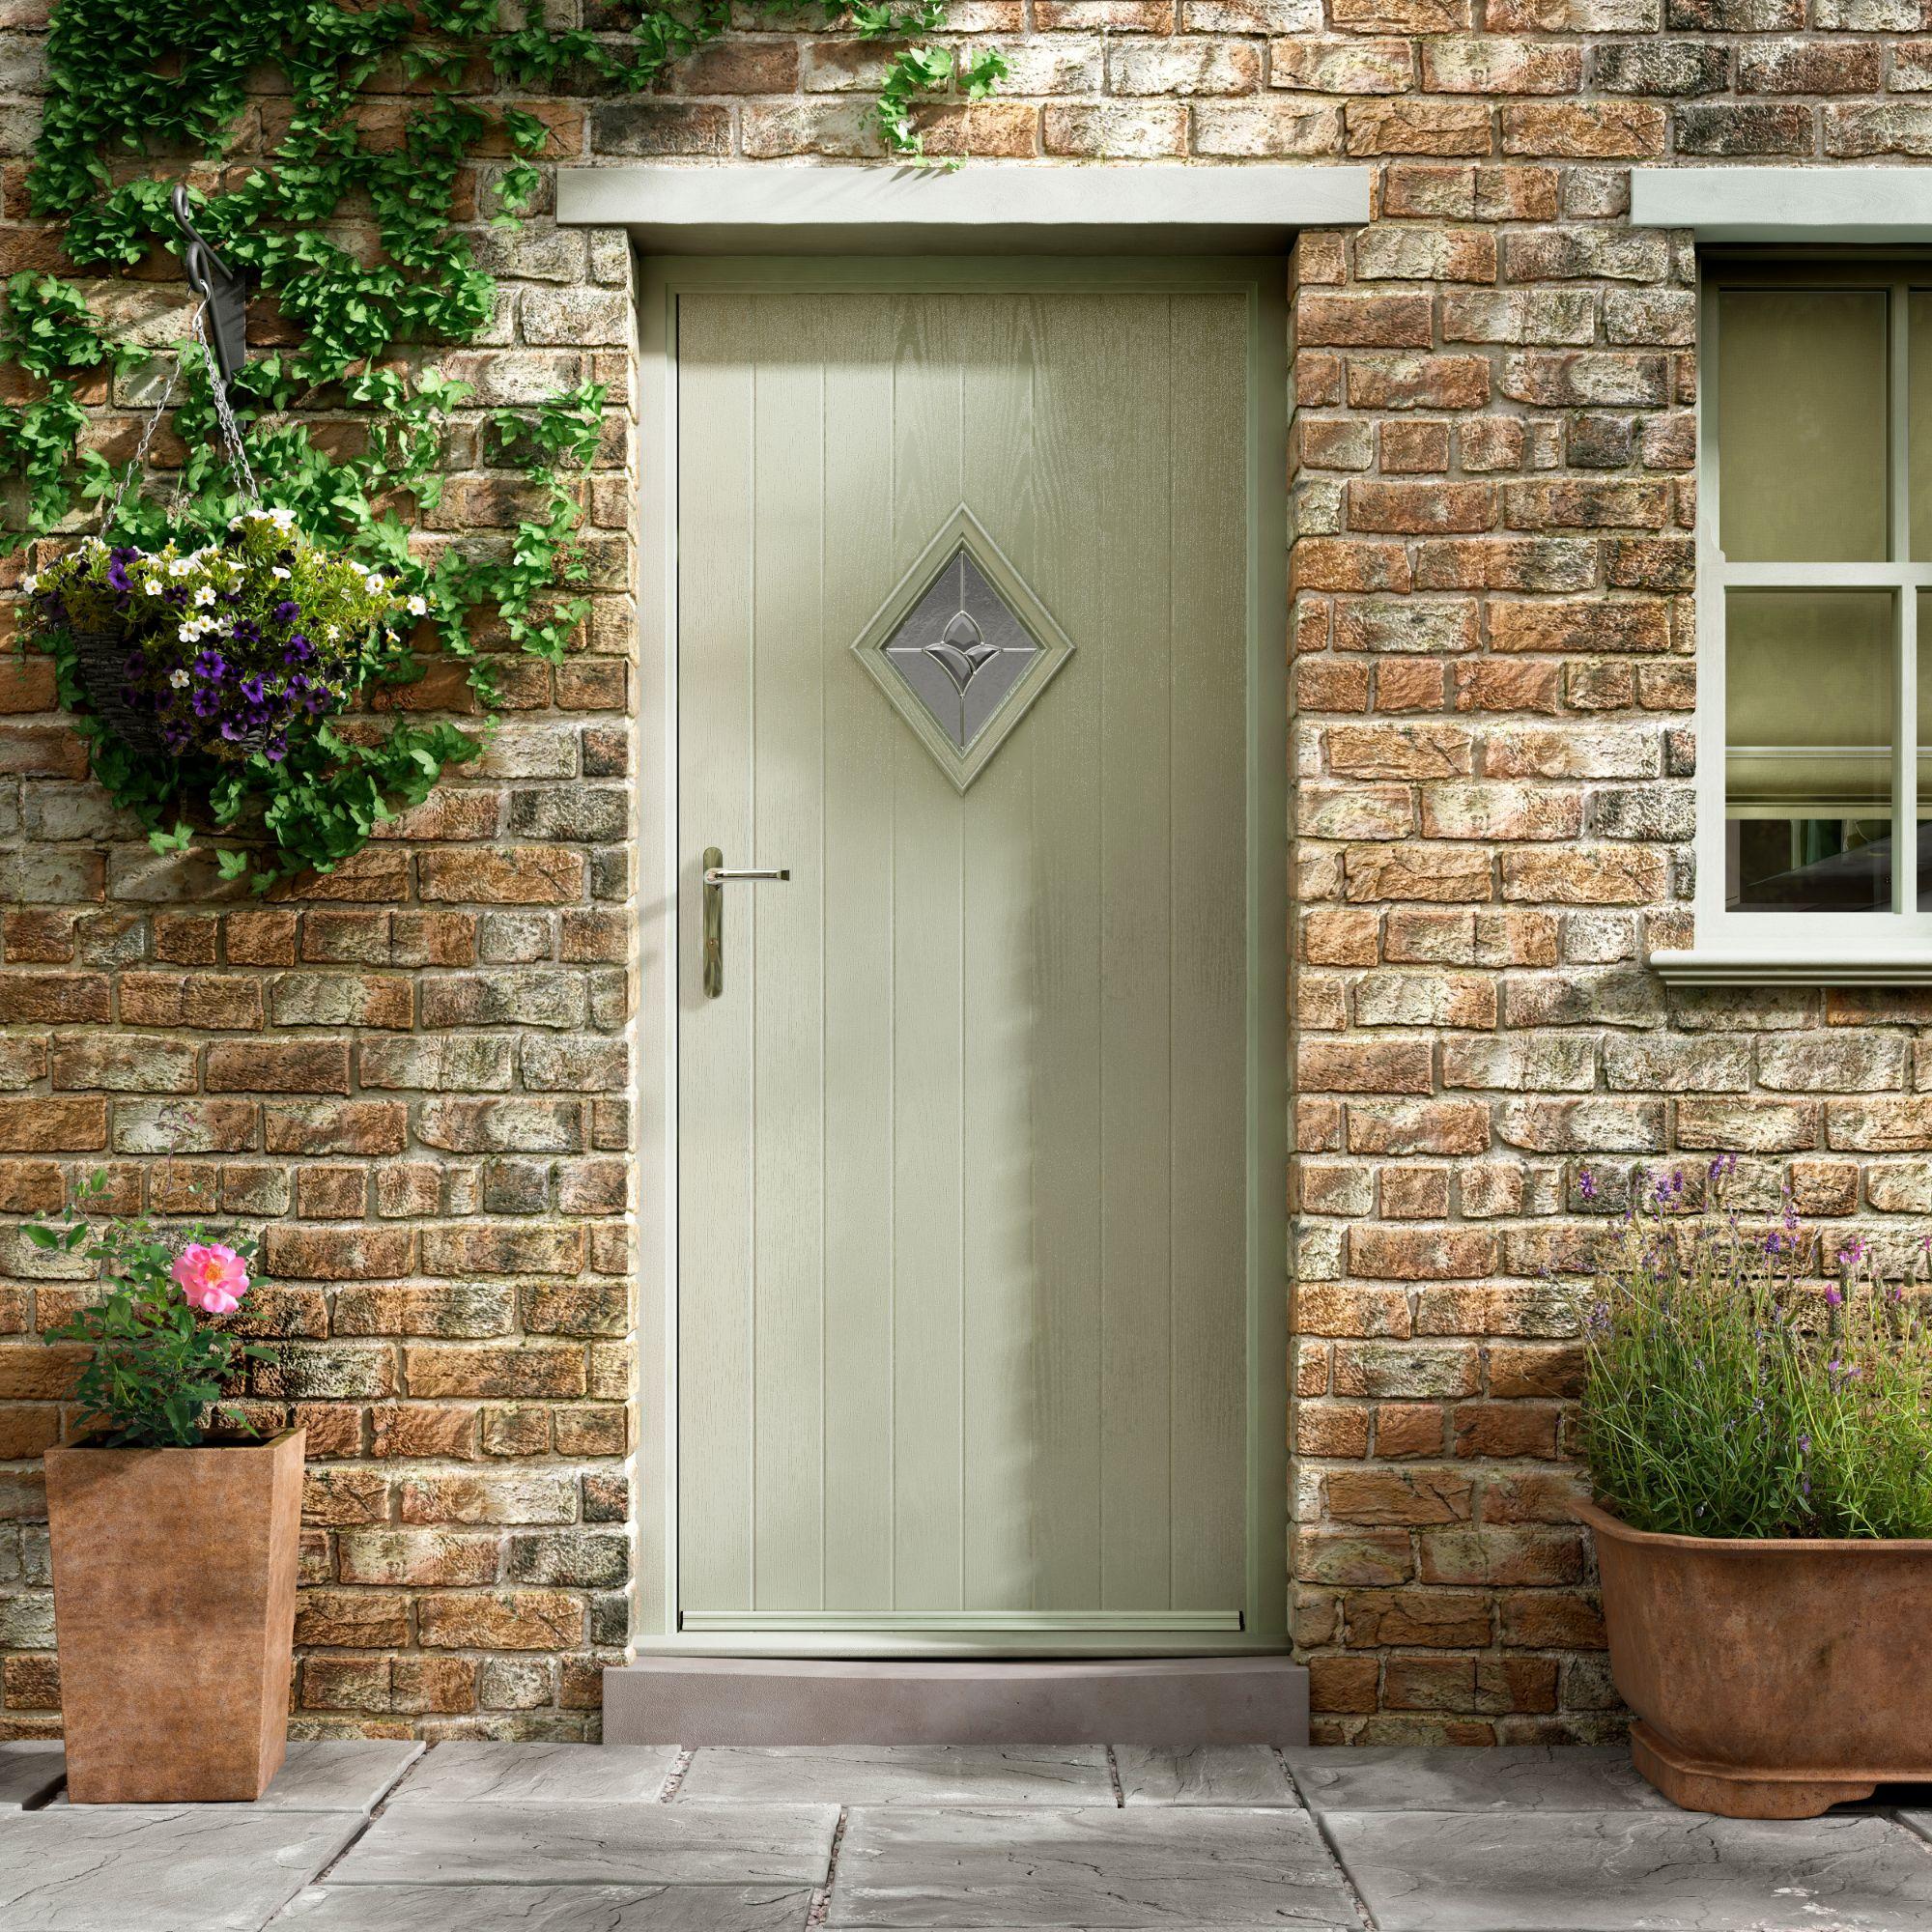 What Is a Composite Door Made Of?